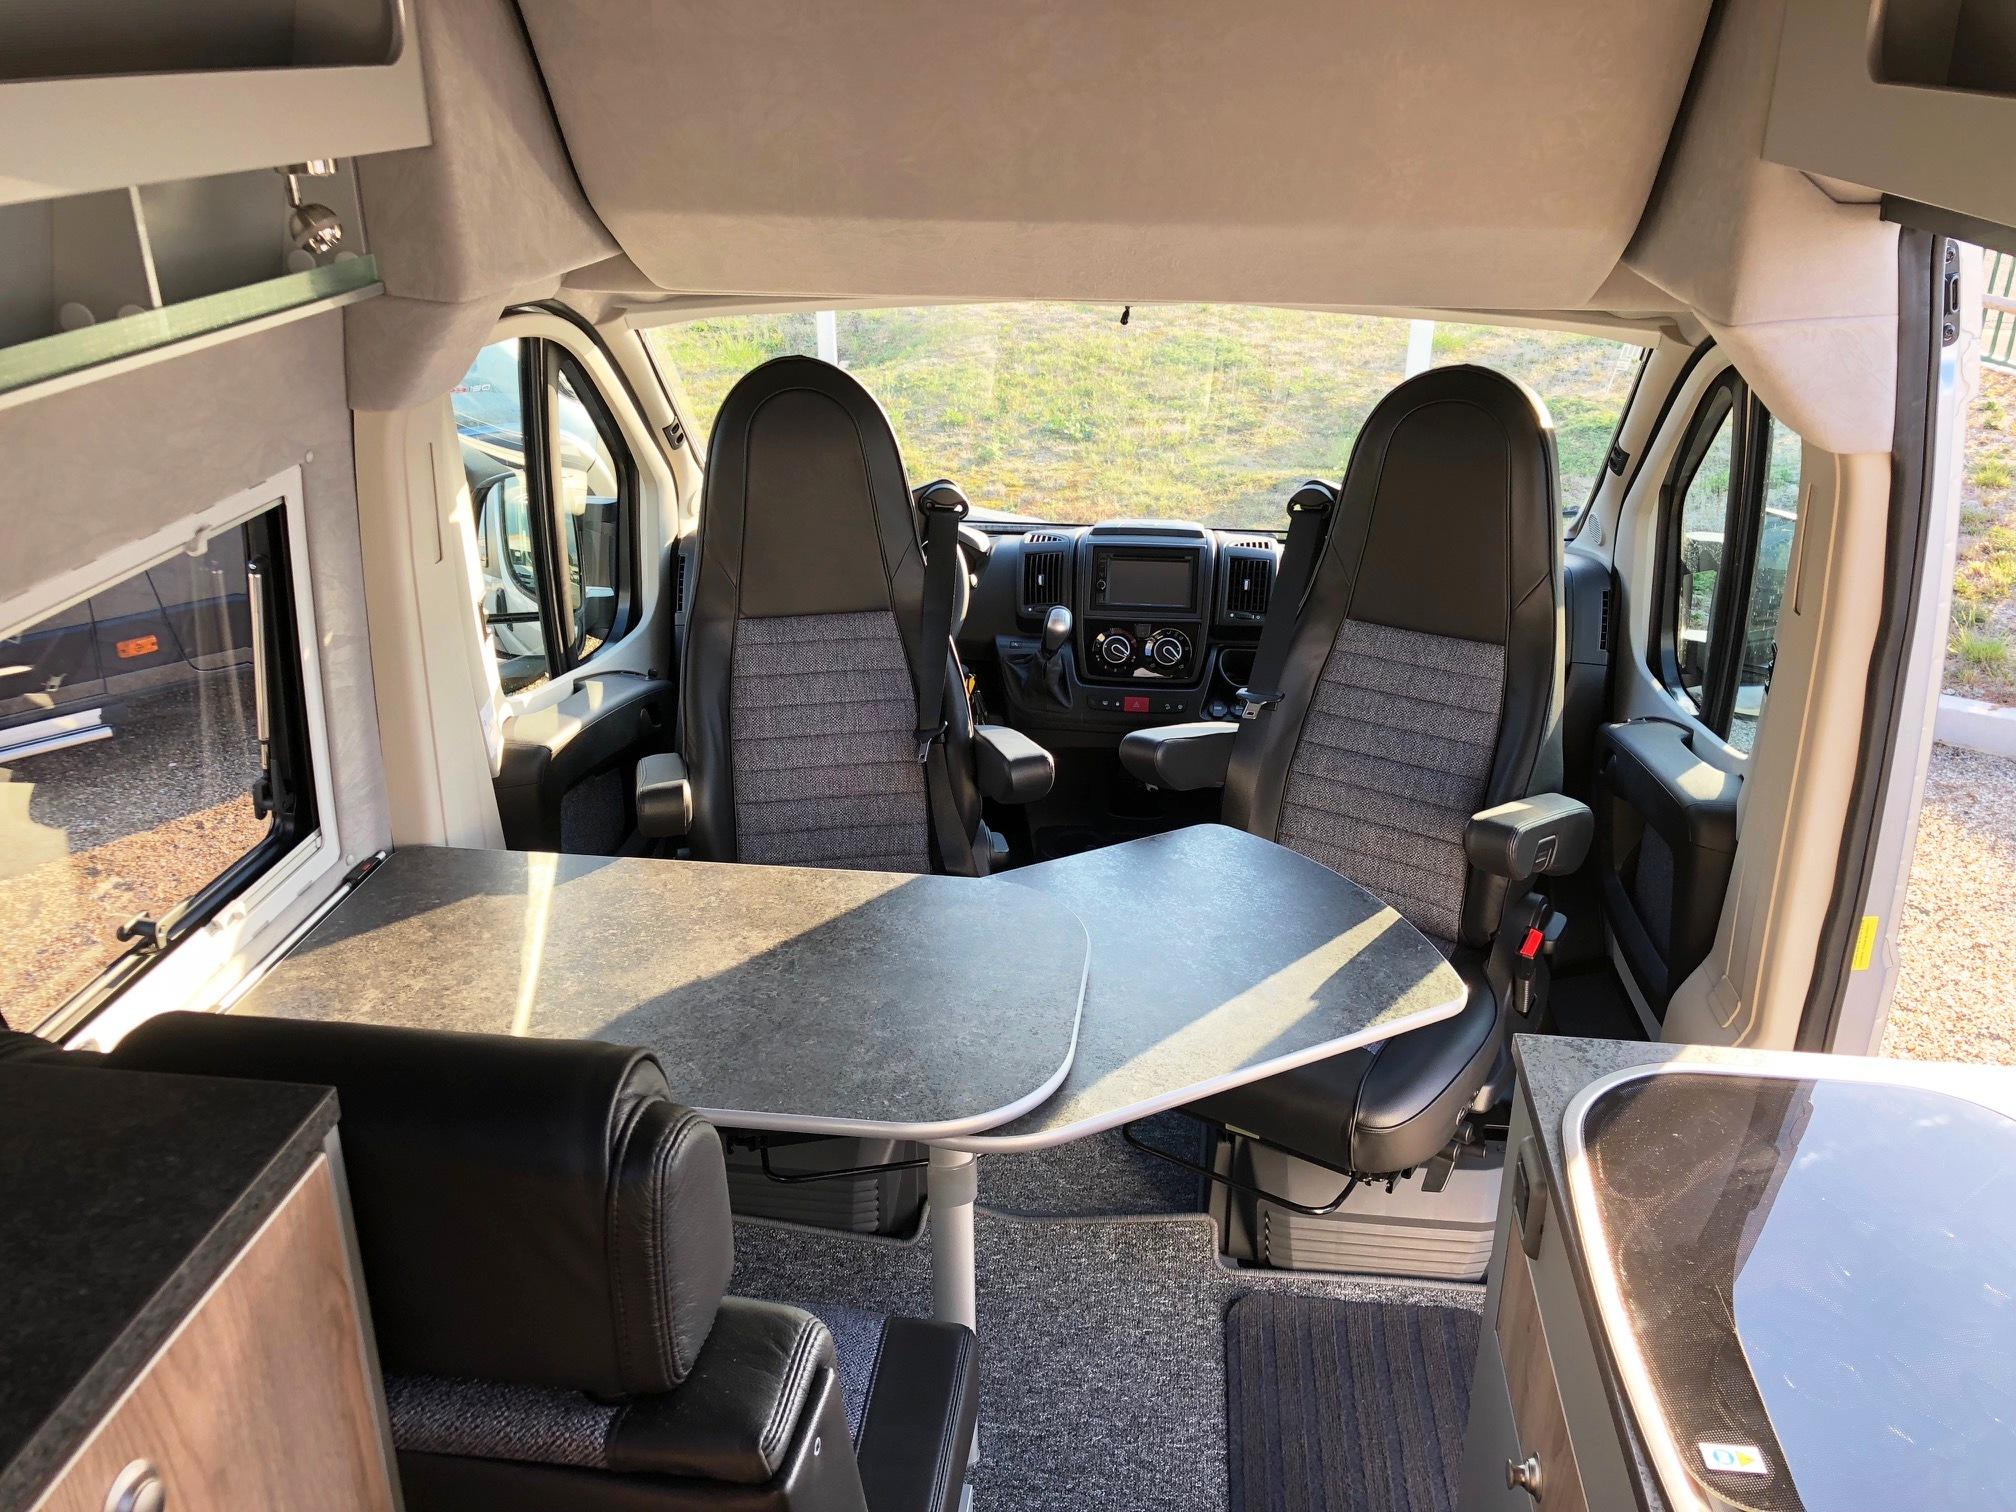 la strada avanti h occasion porteur fiat ducato 2 3 mjt 150 cv bva camping car vendre en. Black Bedroom Furniture Sets. Home Design Ideas